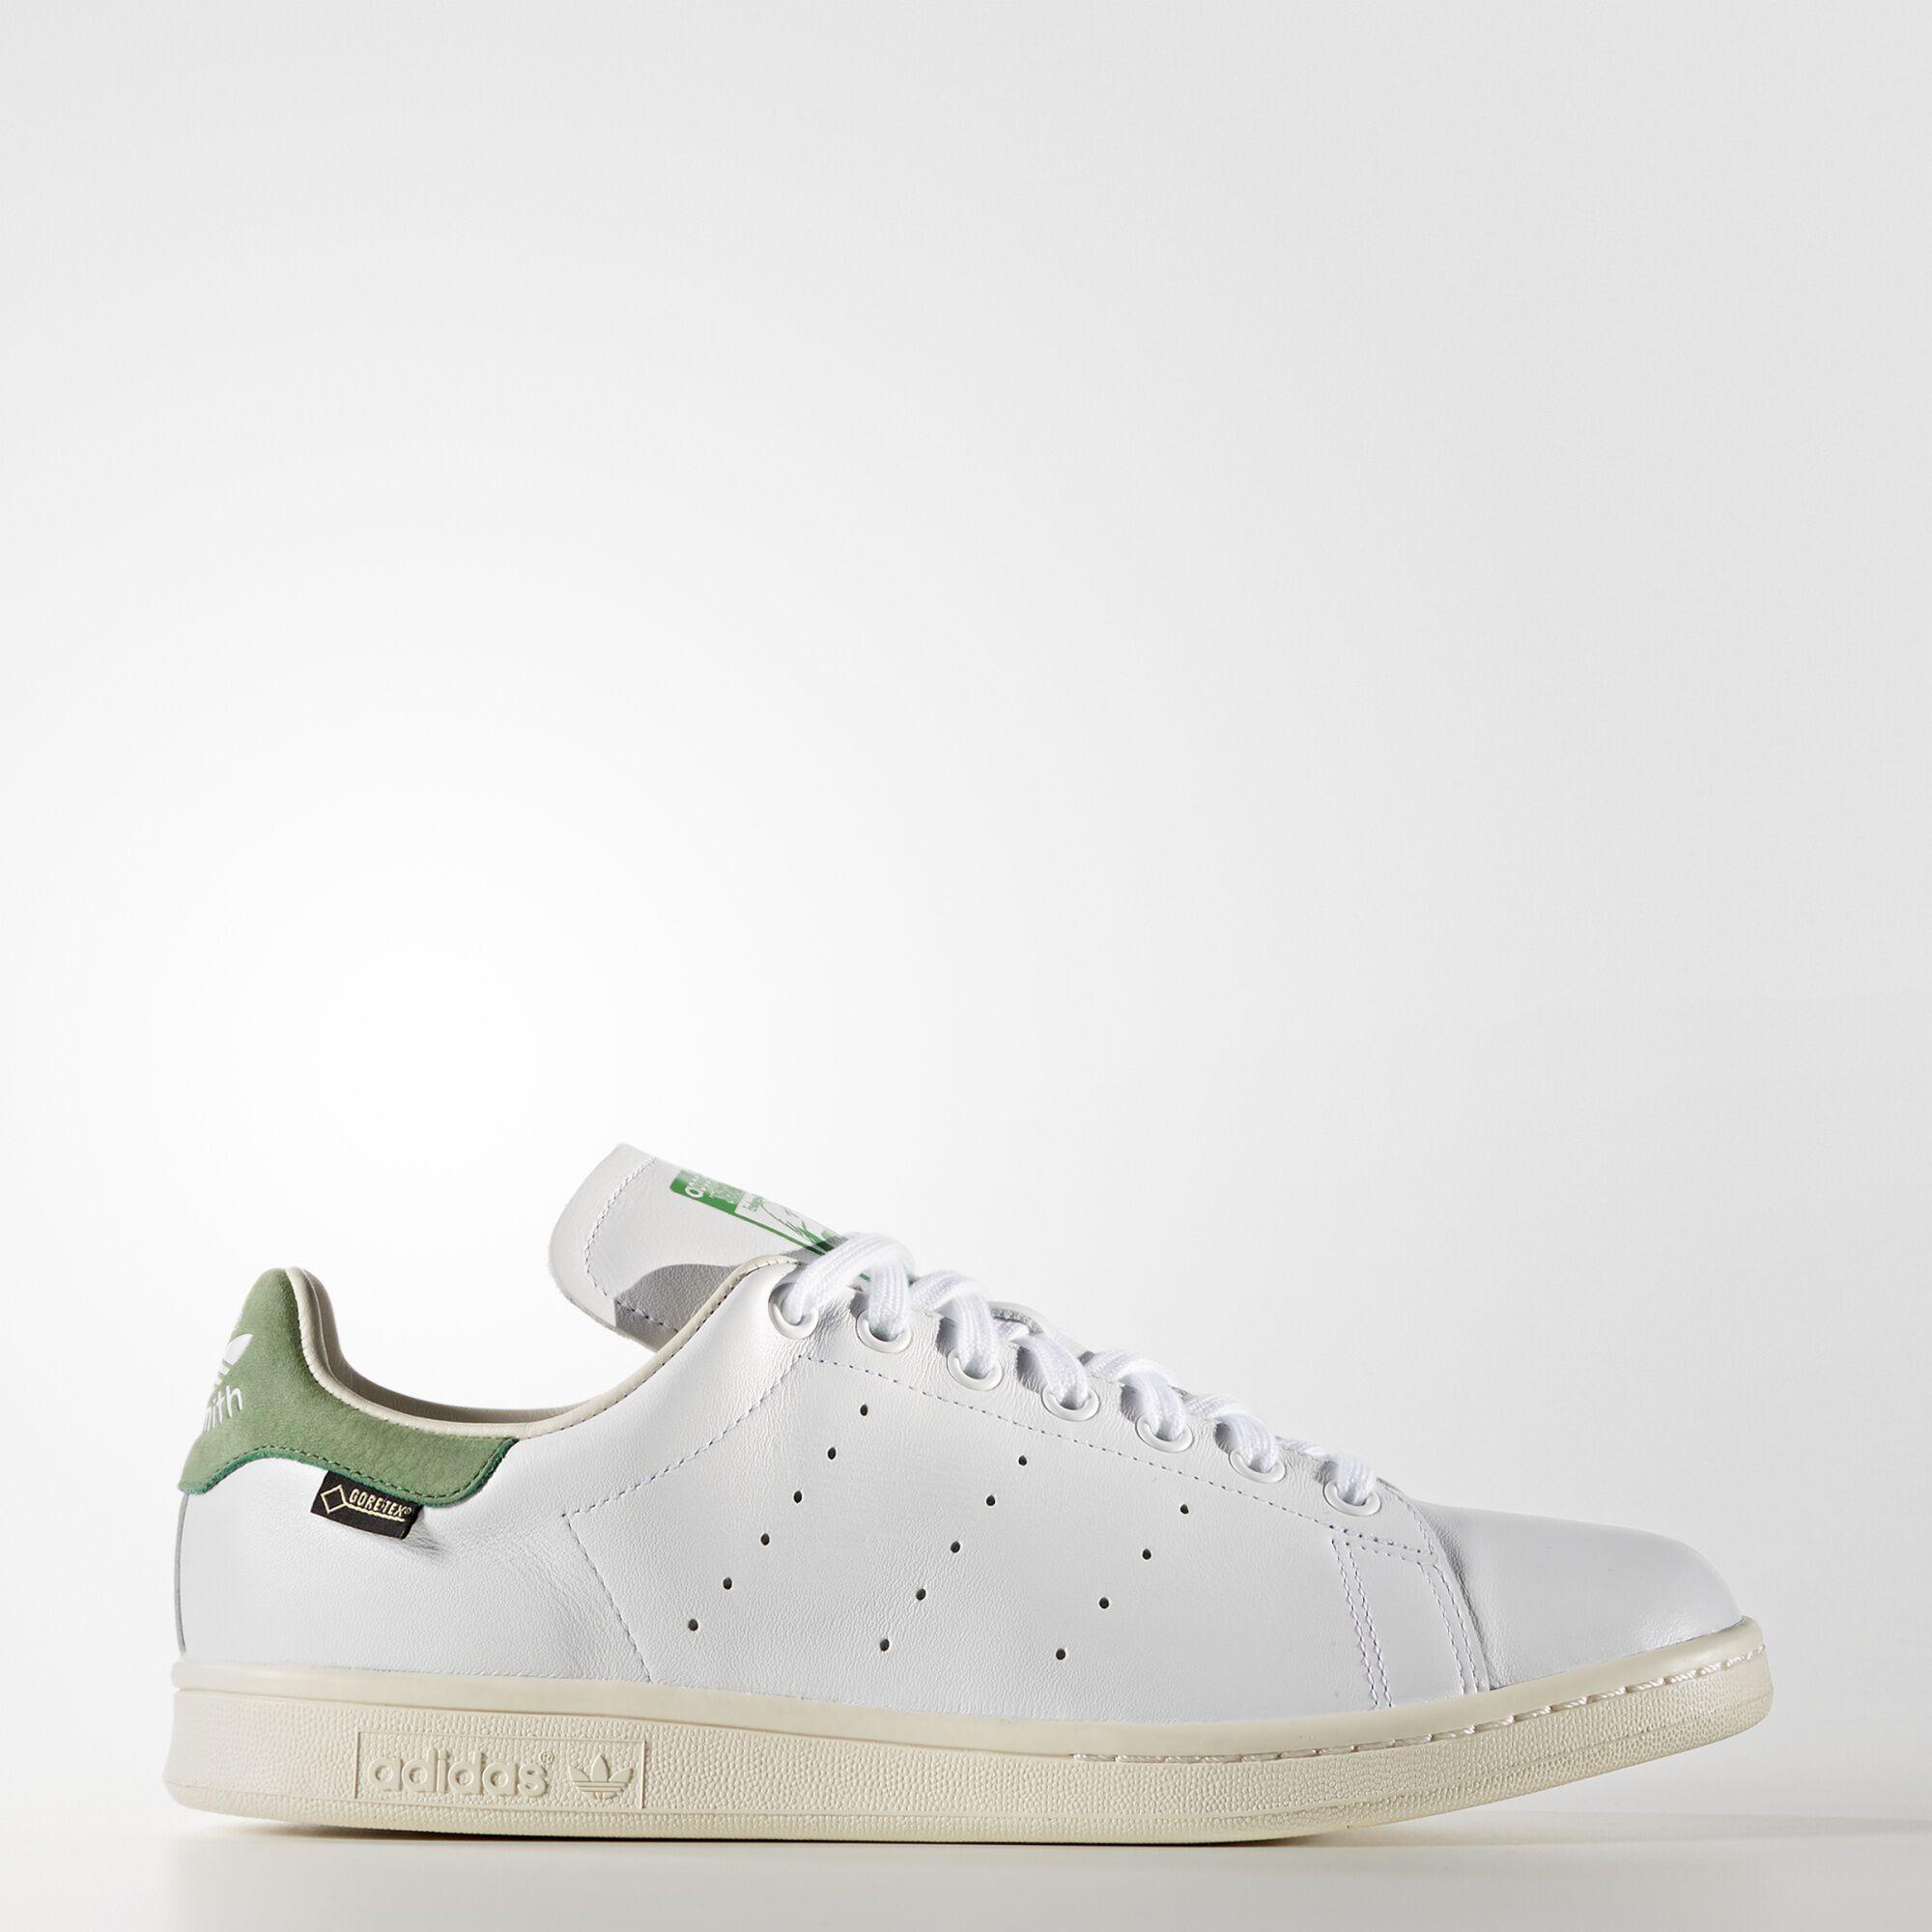 adidas originals stan smith 2 men Green